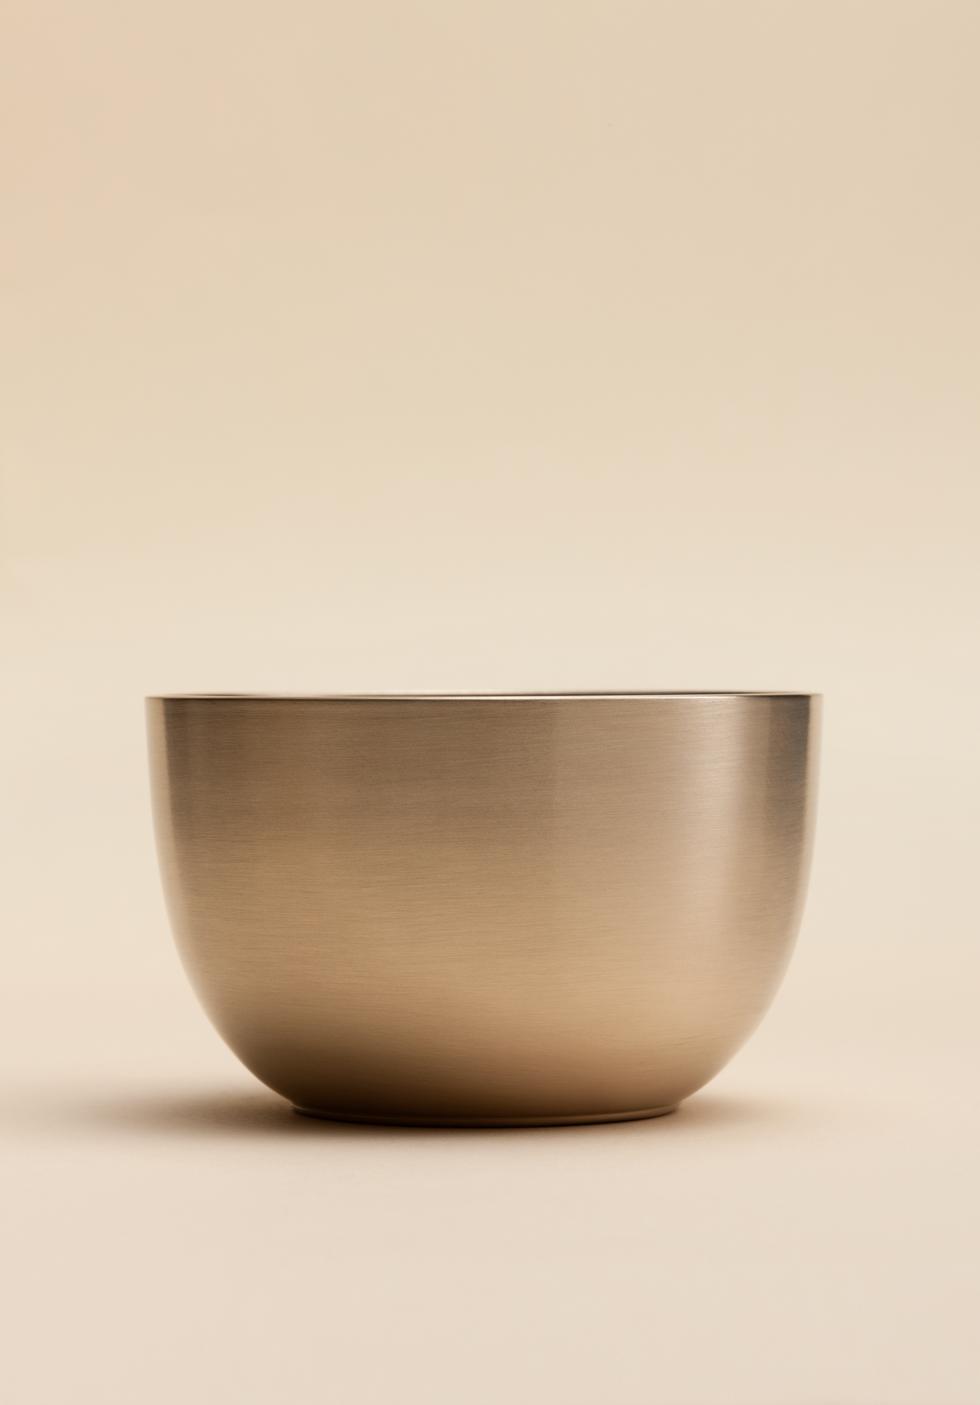 Brass #2 (2014)